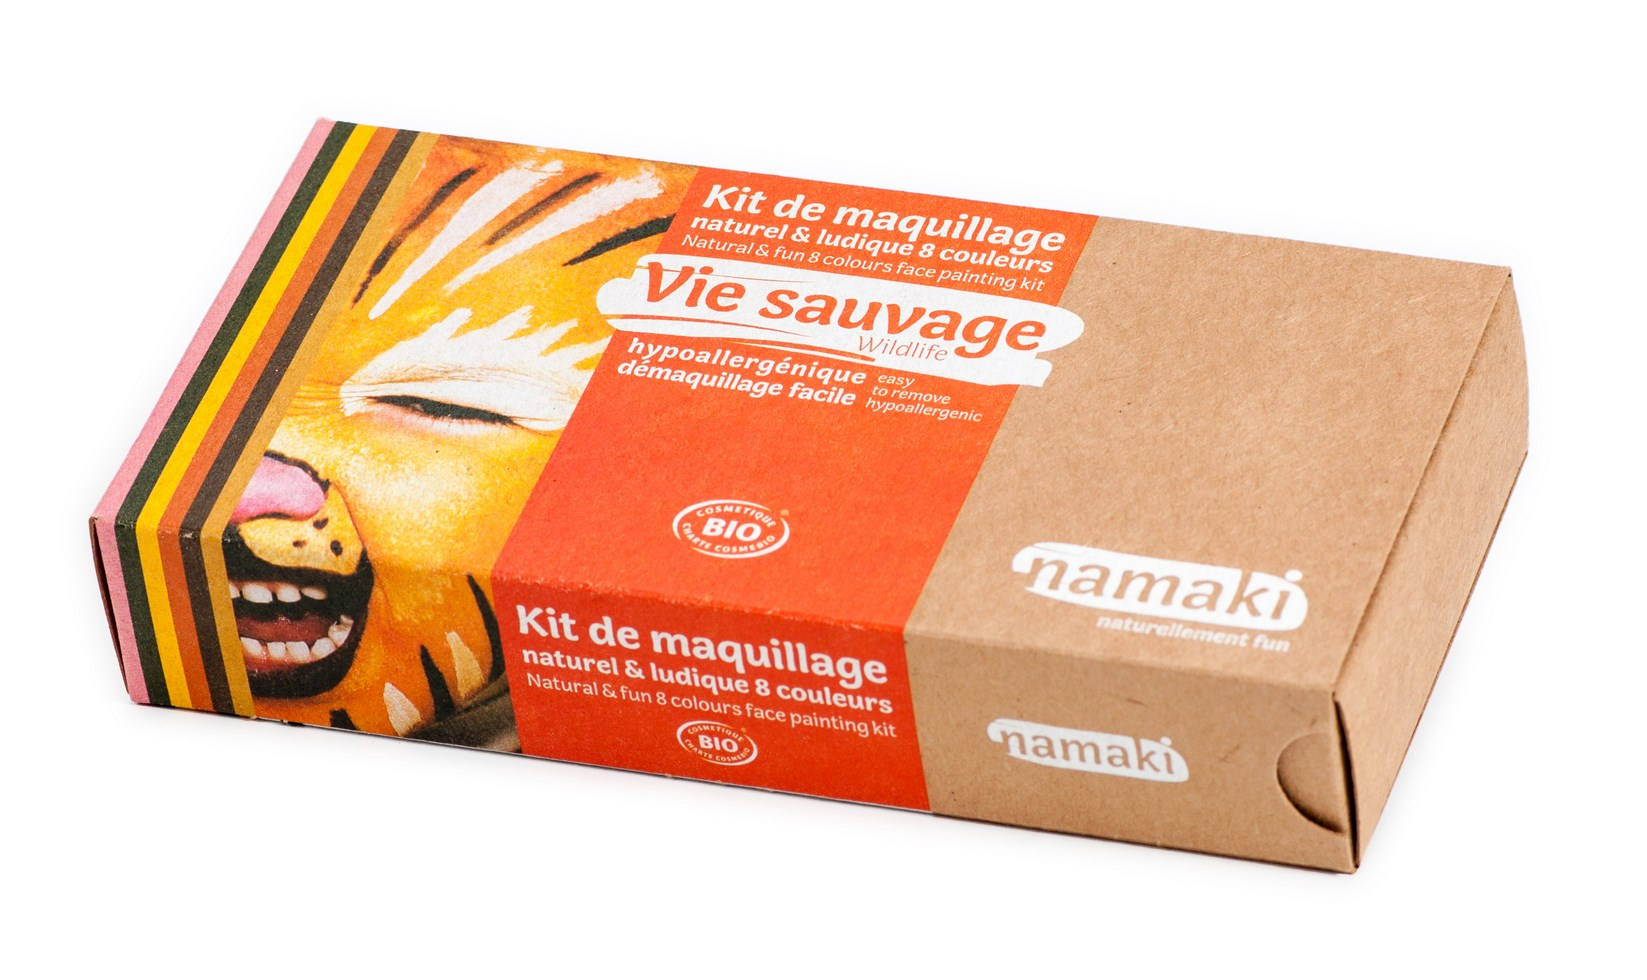 kit-de-maquillage-bio-Namaki-8-couleurs-Vie-sauvage-vue-3d-1461936997.jpg